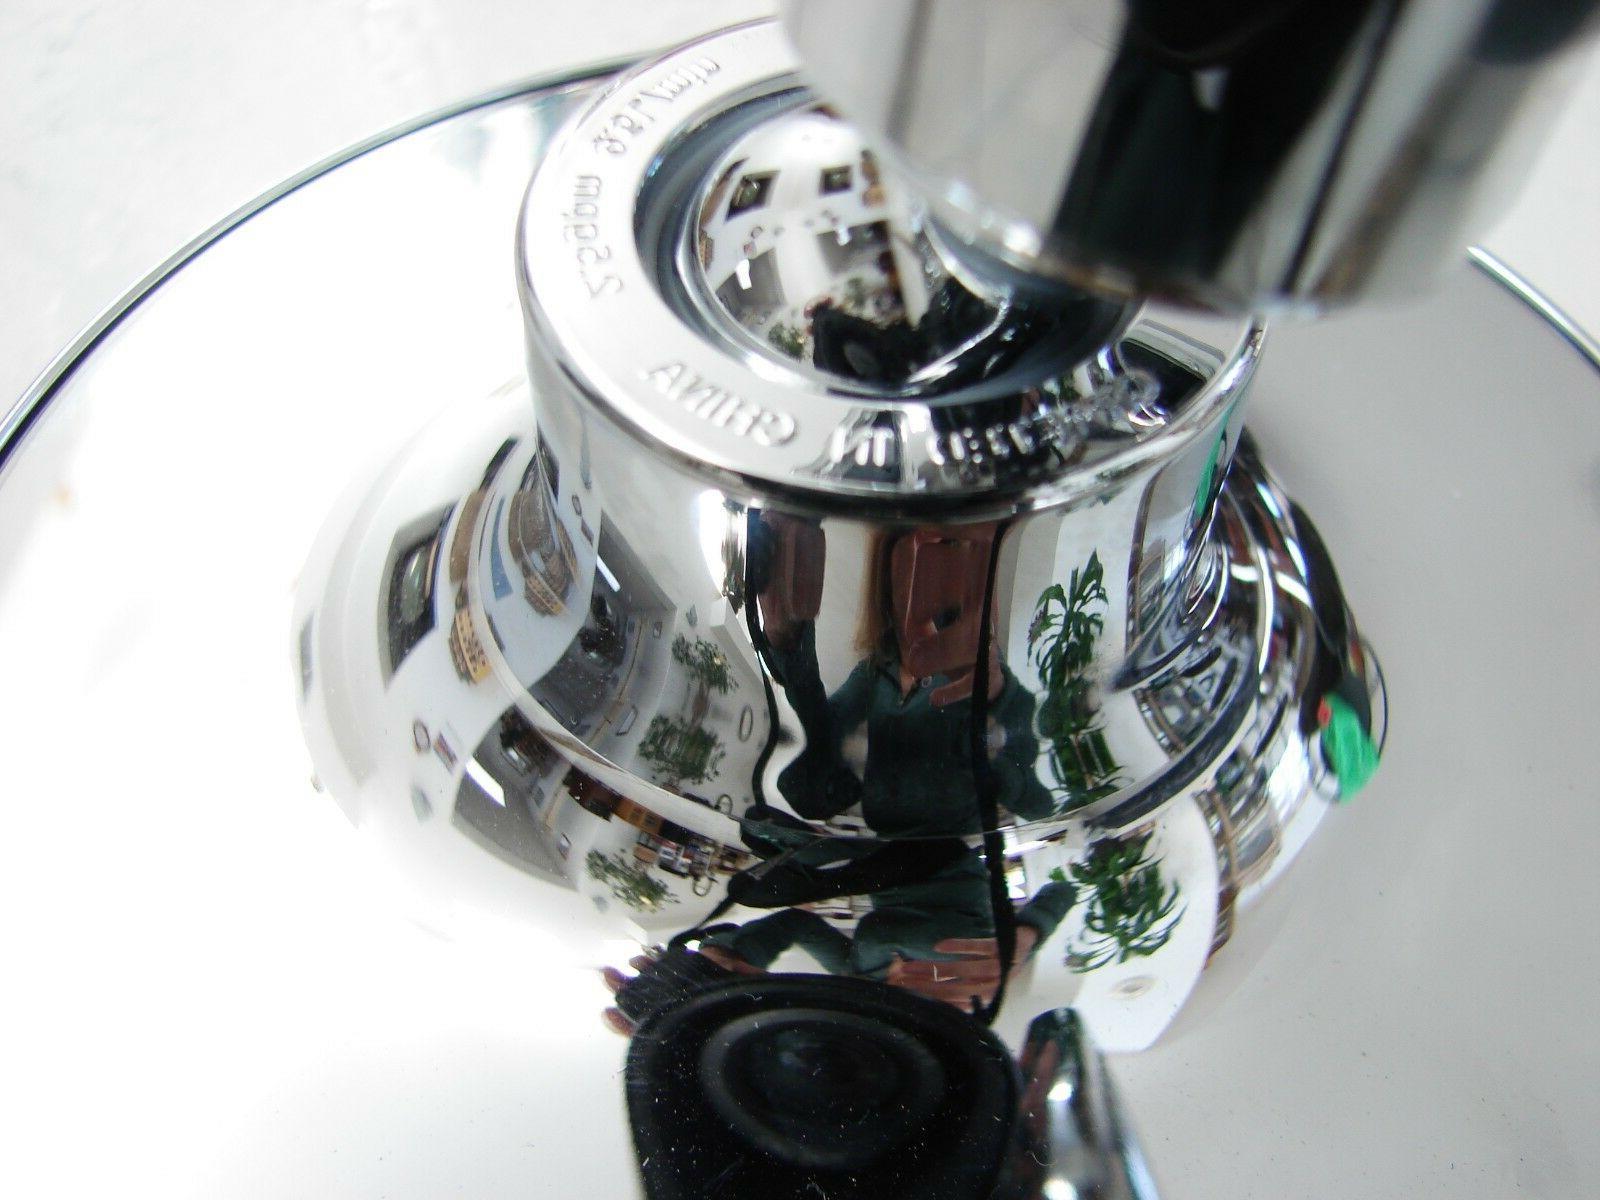 Kohler Shower Head With Attaching Bar Chrome Metal